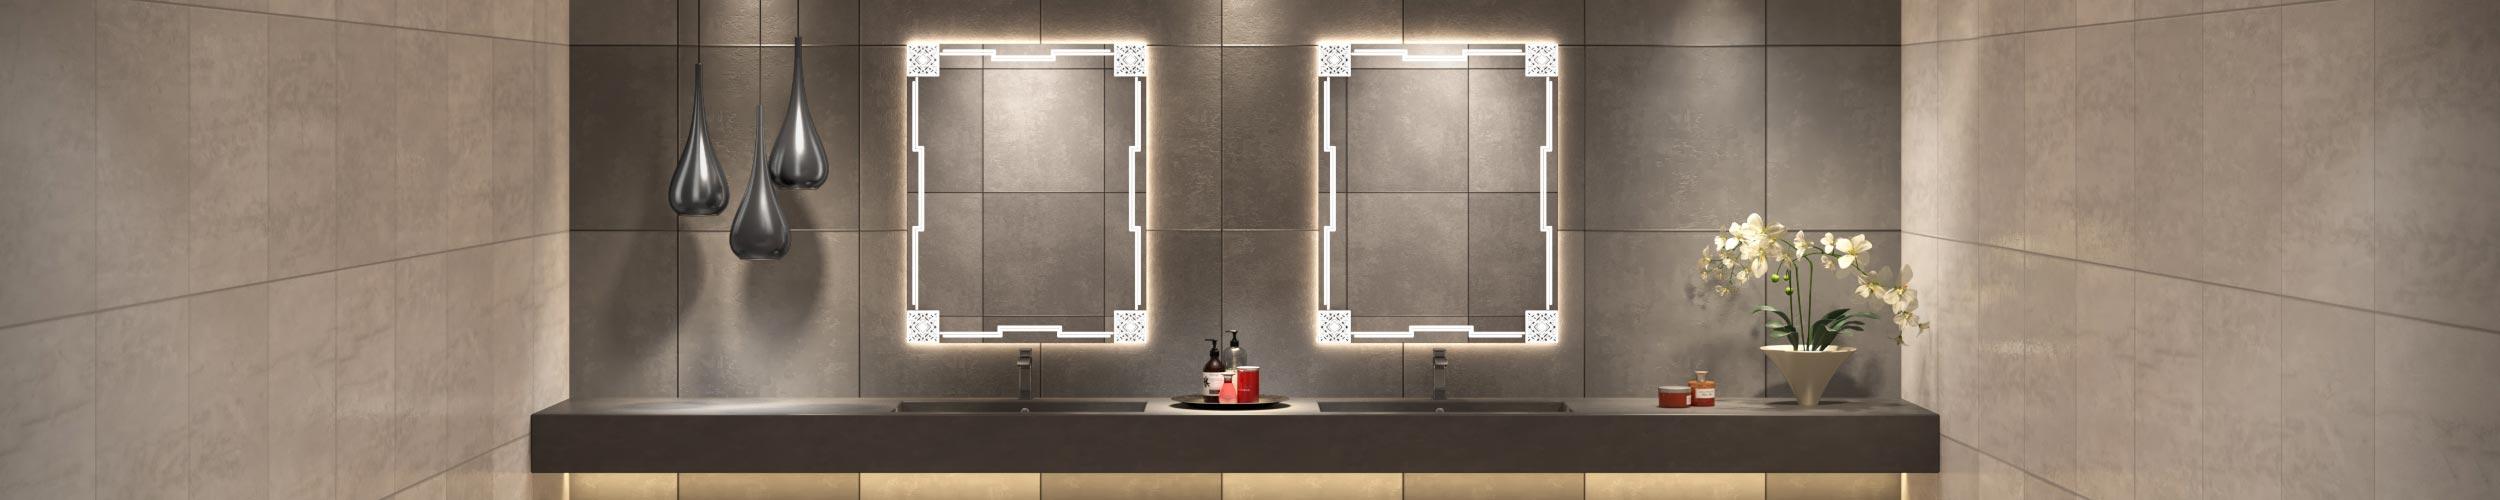 Double Sink Grand Mirrors Etch Mirror in Gatsby Design